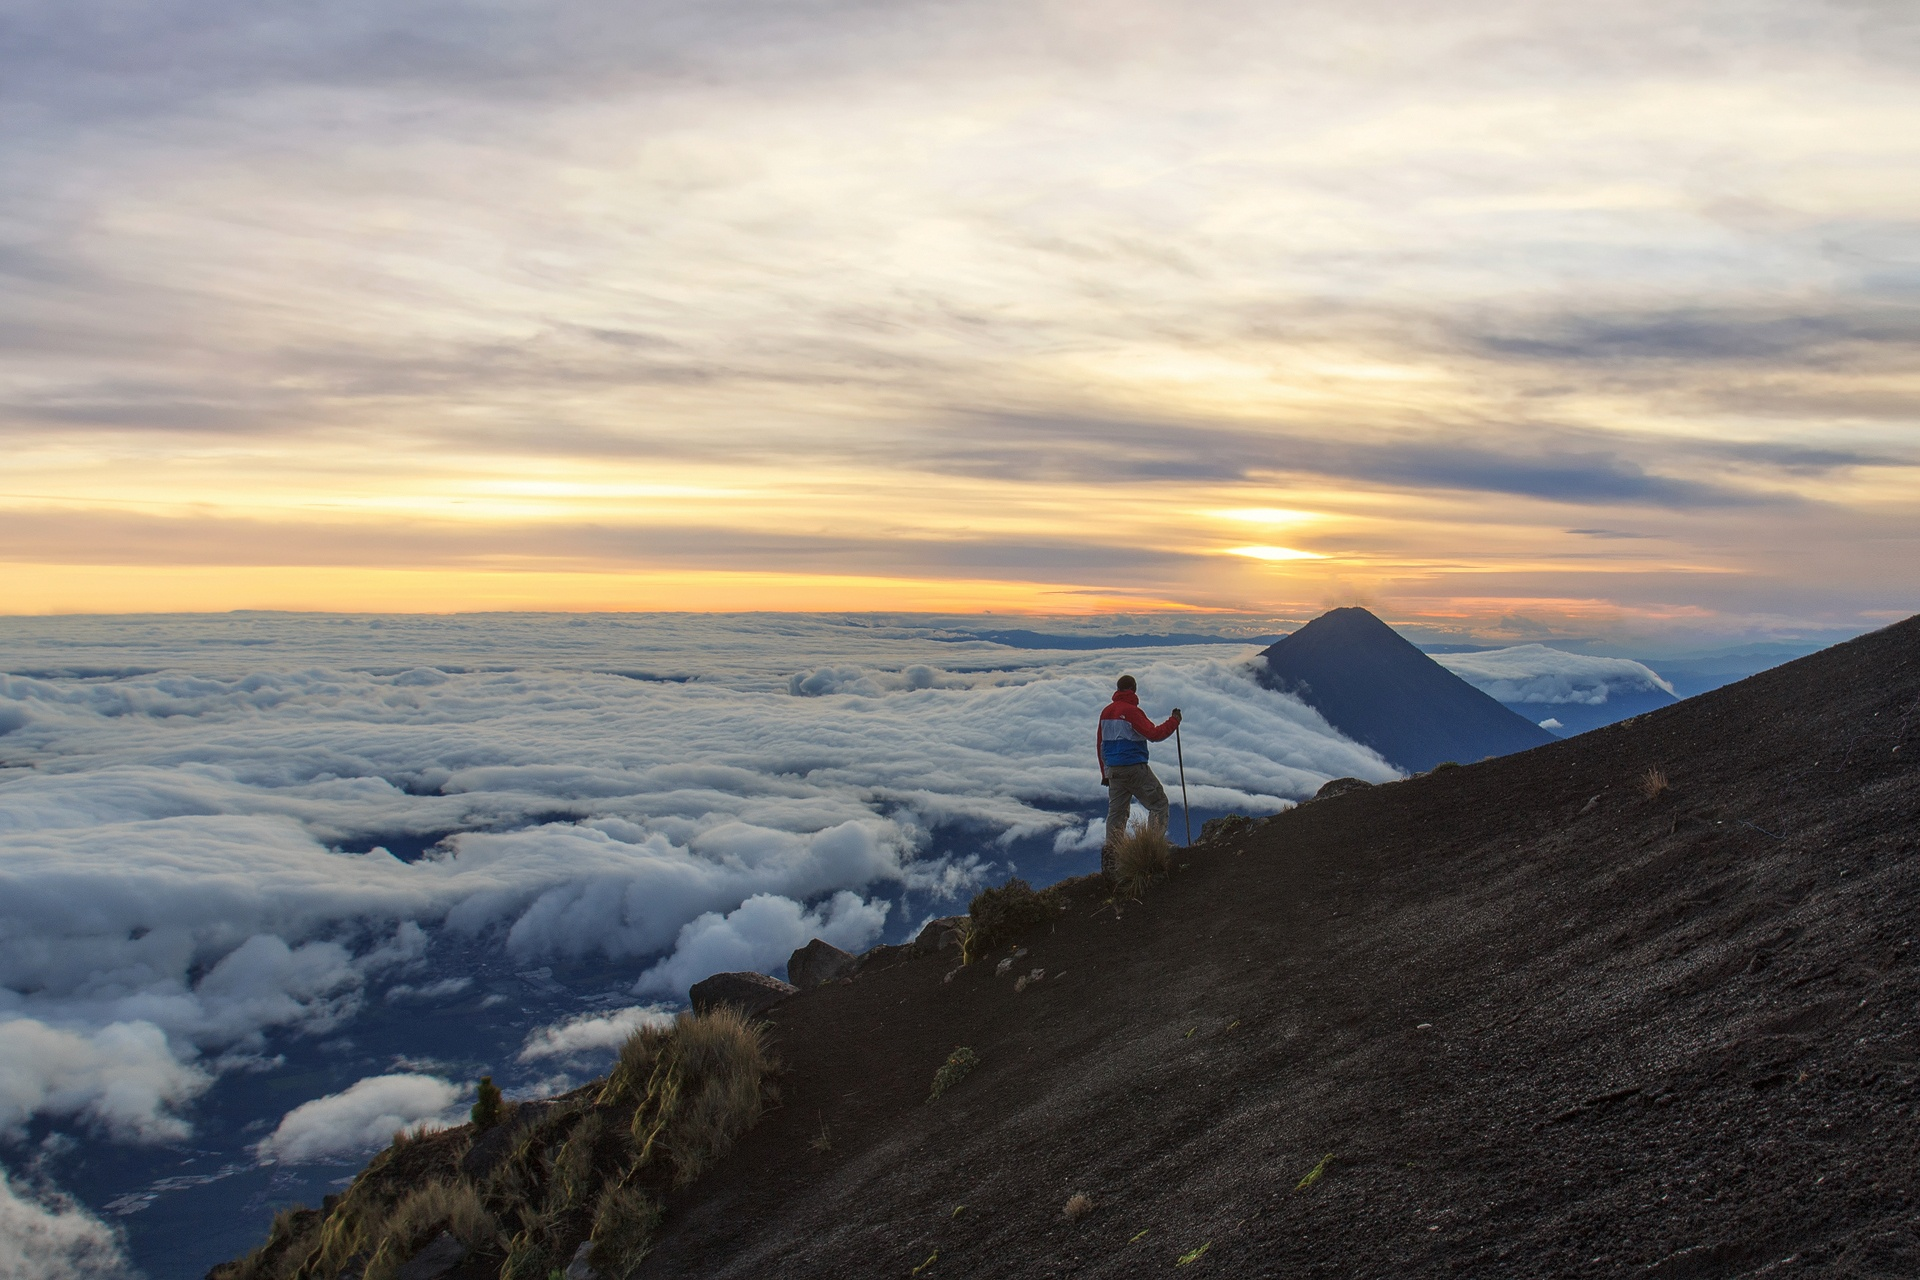 vulcan, volcano, vulkan, antigua, guatemala, agua, fuego, atacenango, hiking, adventure, clouds, sun, epic, trekking, majestic view,